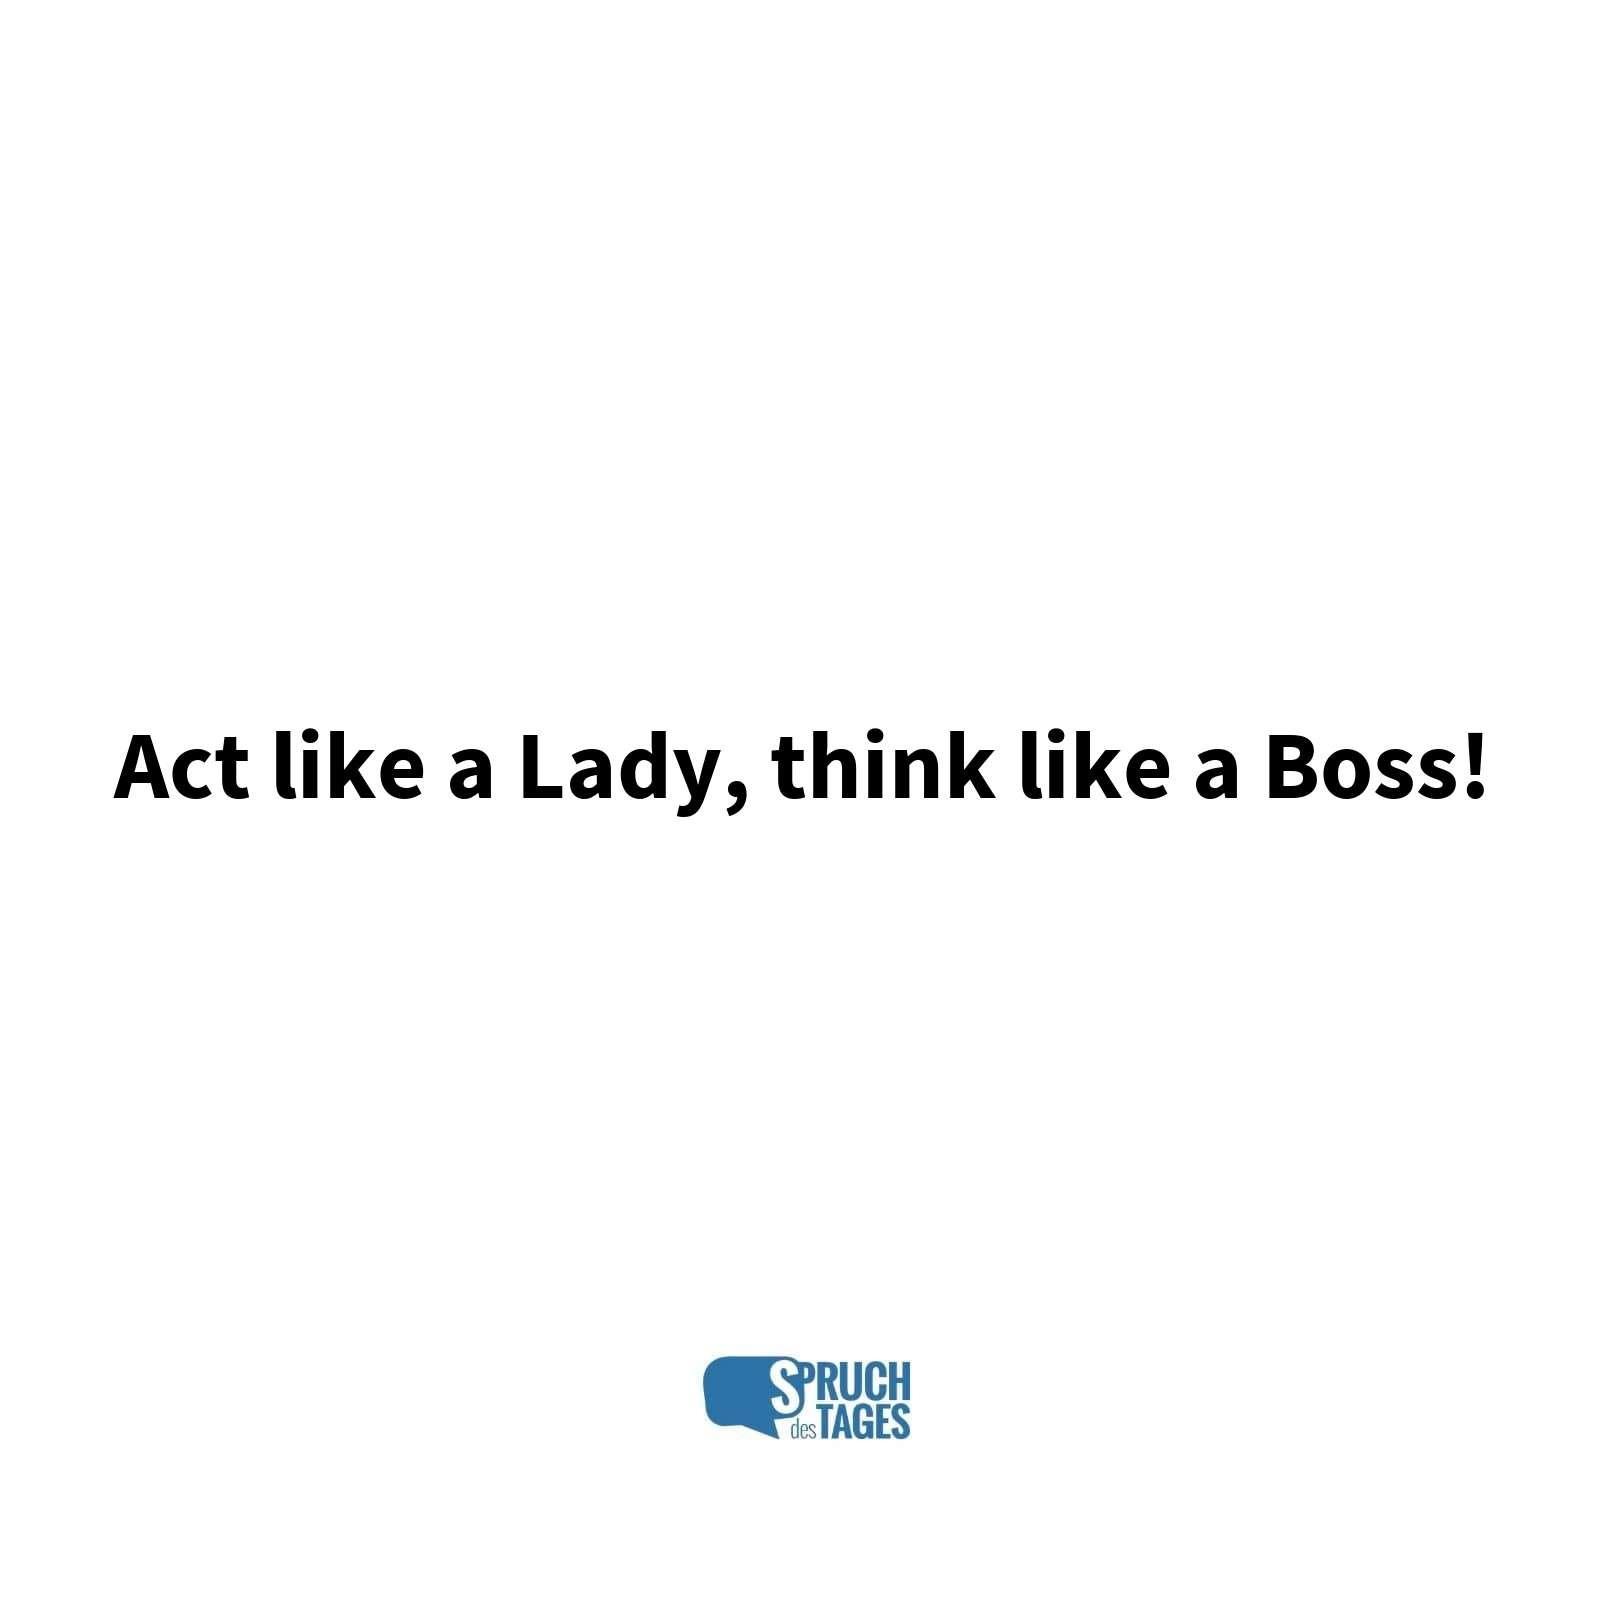 lady sprüche Act like a Lady, think like a Boss! lady sprüche